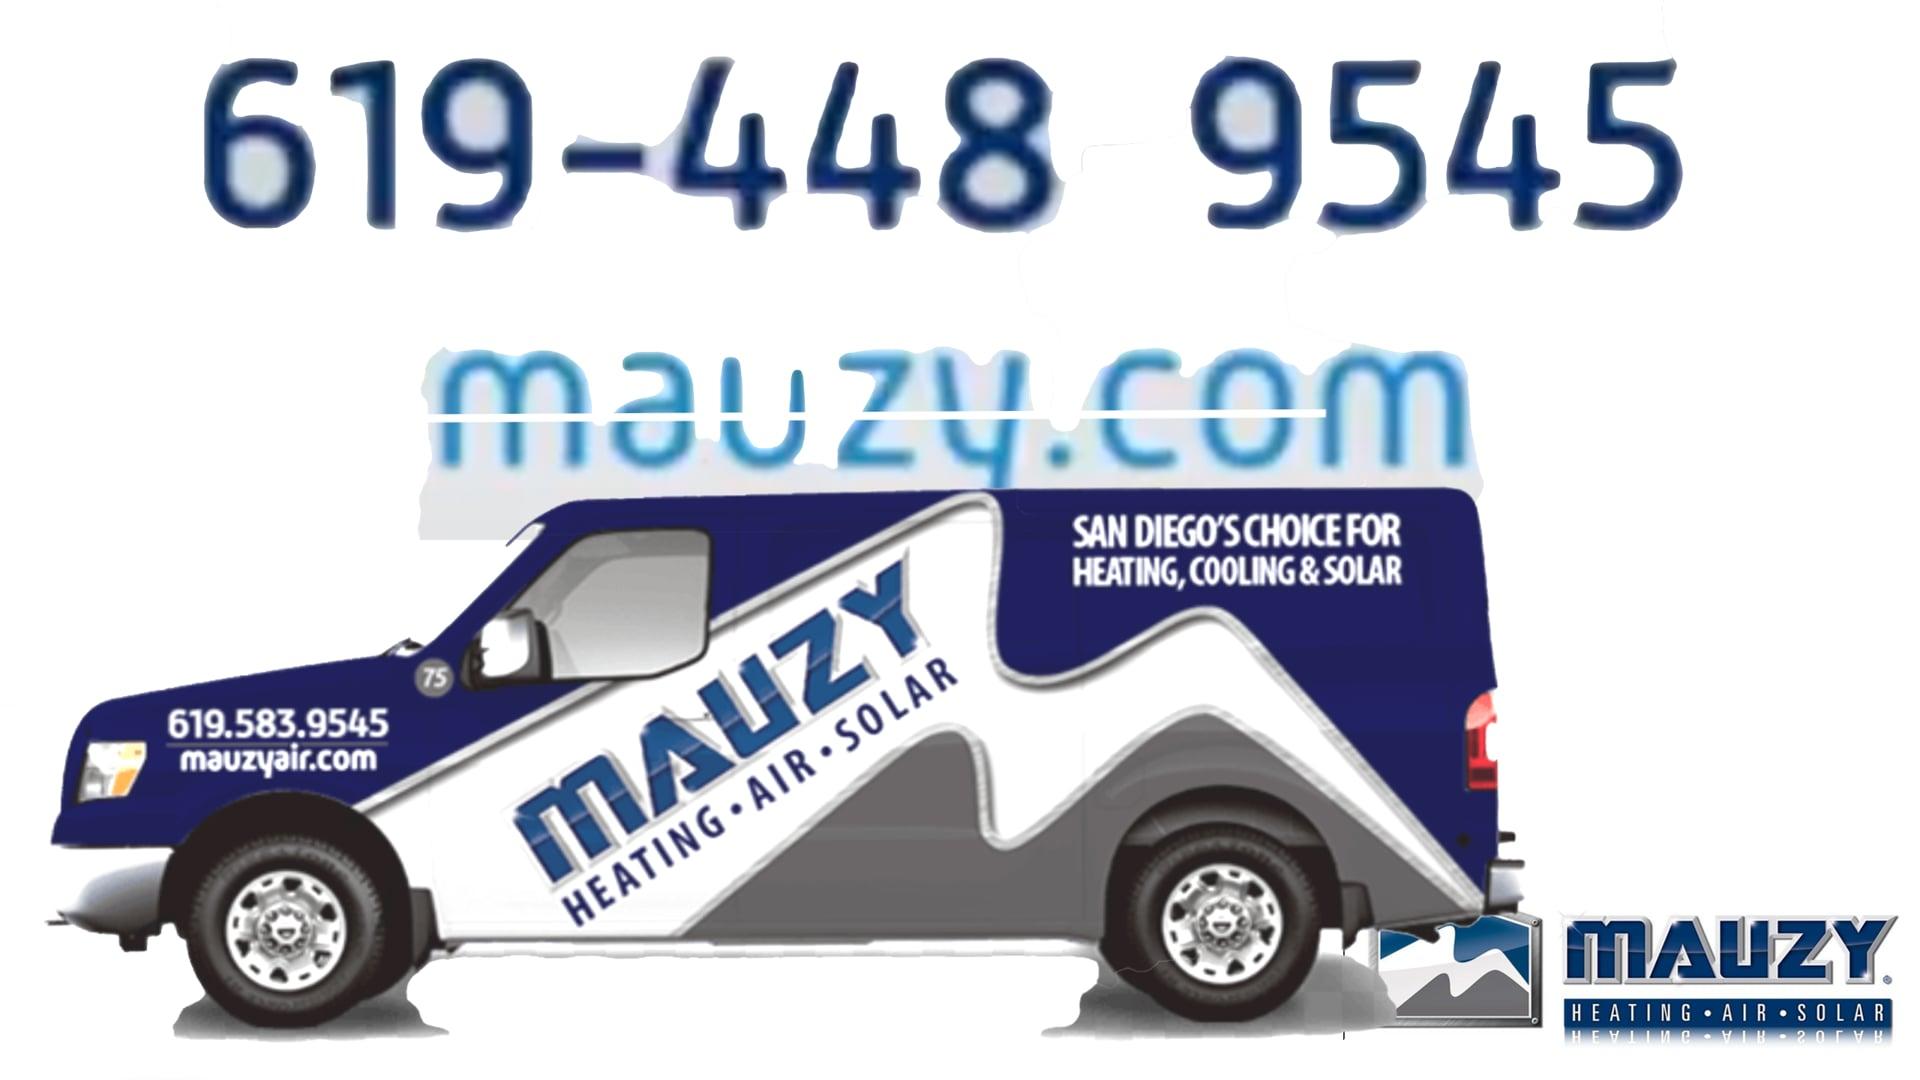 619-448-9545 Best HVAC Repair Company in San Diego California Mauzy.com